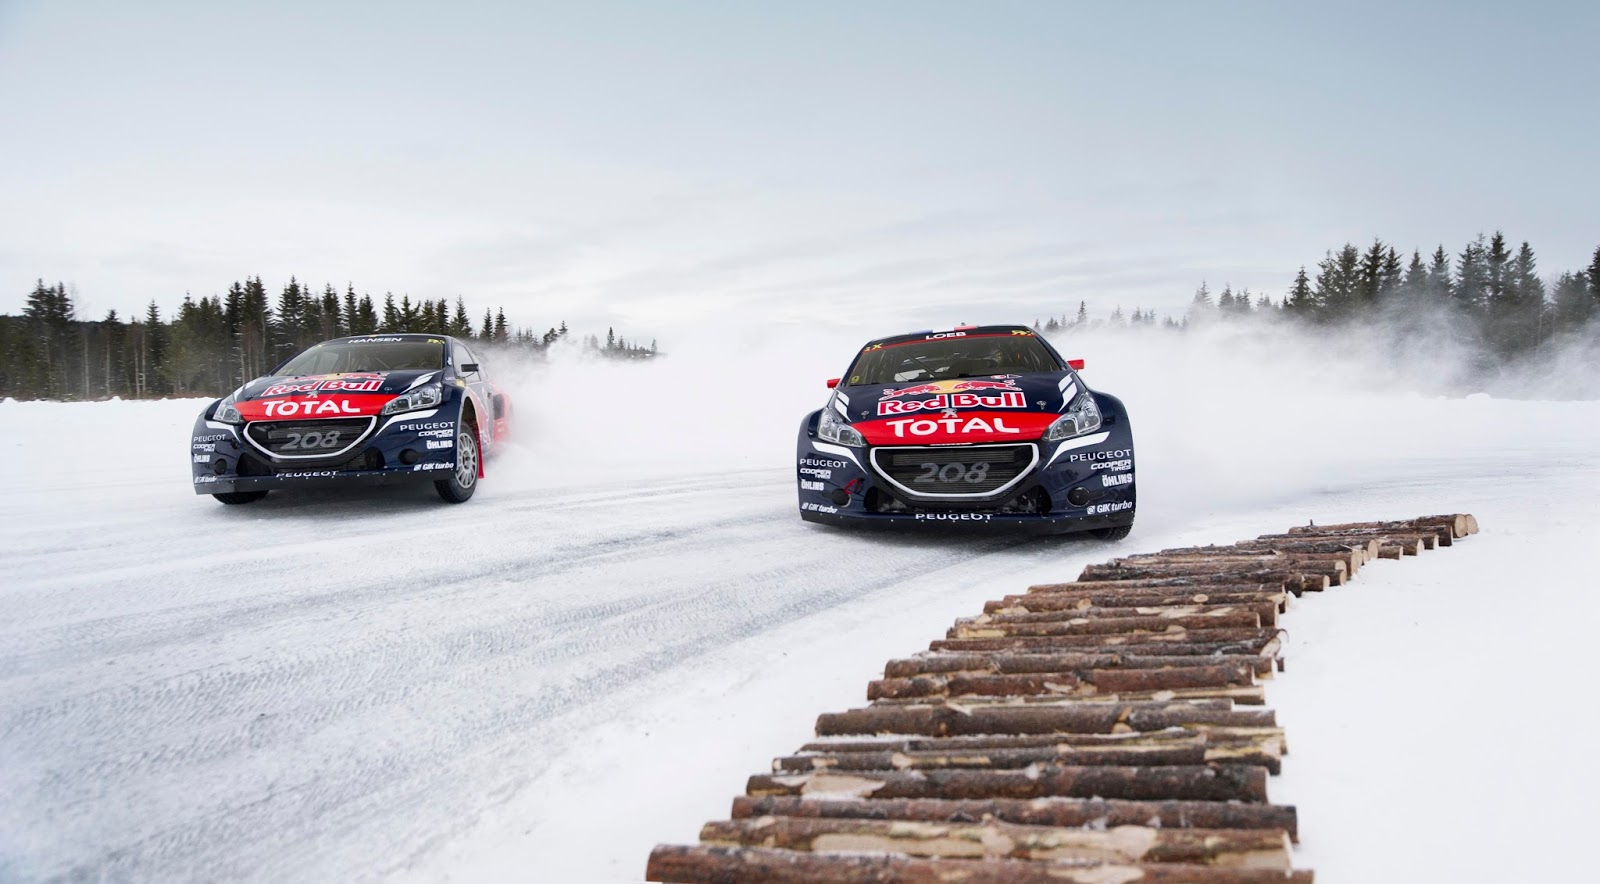 56d0772c817b2255B1255D Έτοιμα για μάχη τα PEUGEOT 208 WRX, έτοιμος και ο Sébastien Loeb για το World RX! Hansen Motorsport, Peugeot, PEUGEOT 208 WRX, Peugeot Sport, Rally, Rallycross, videos, World RX, zblog